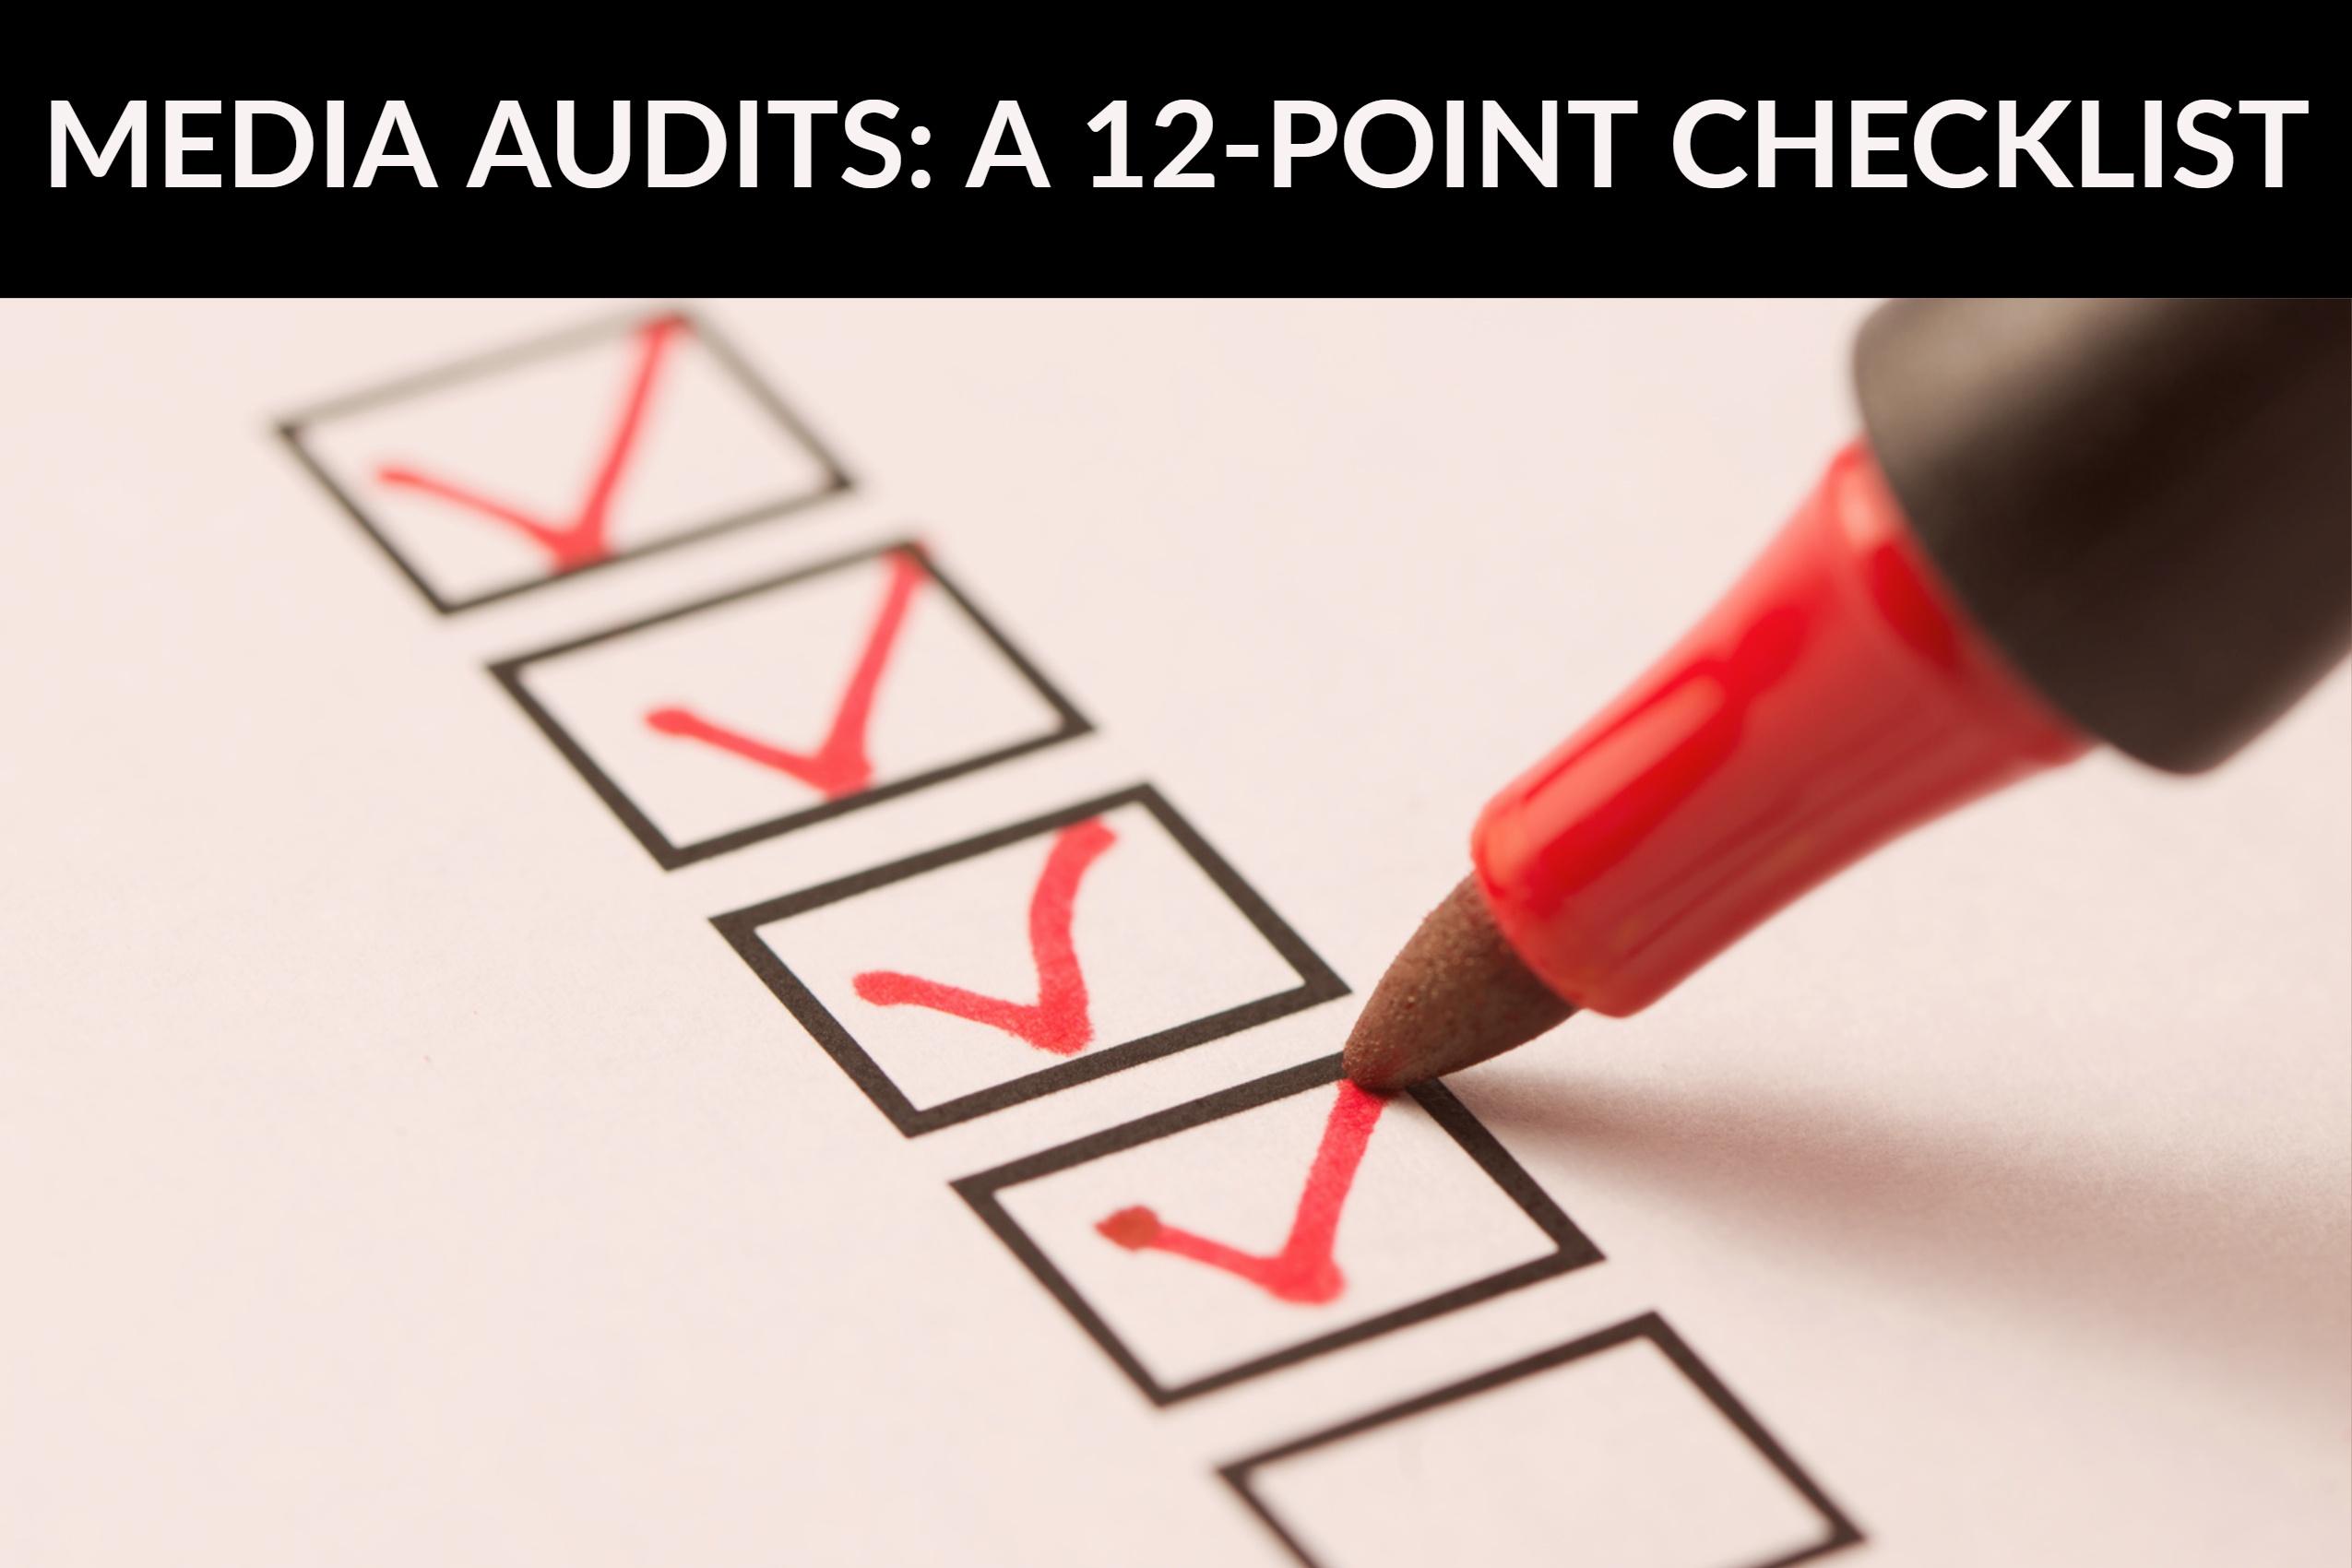 Media Audits_ A 12-Point Checklist